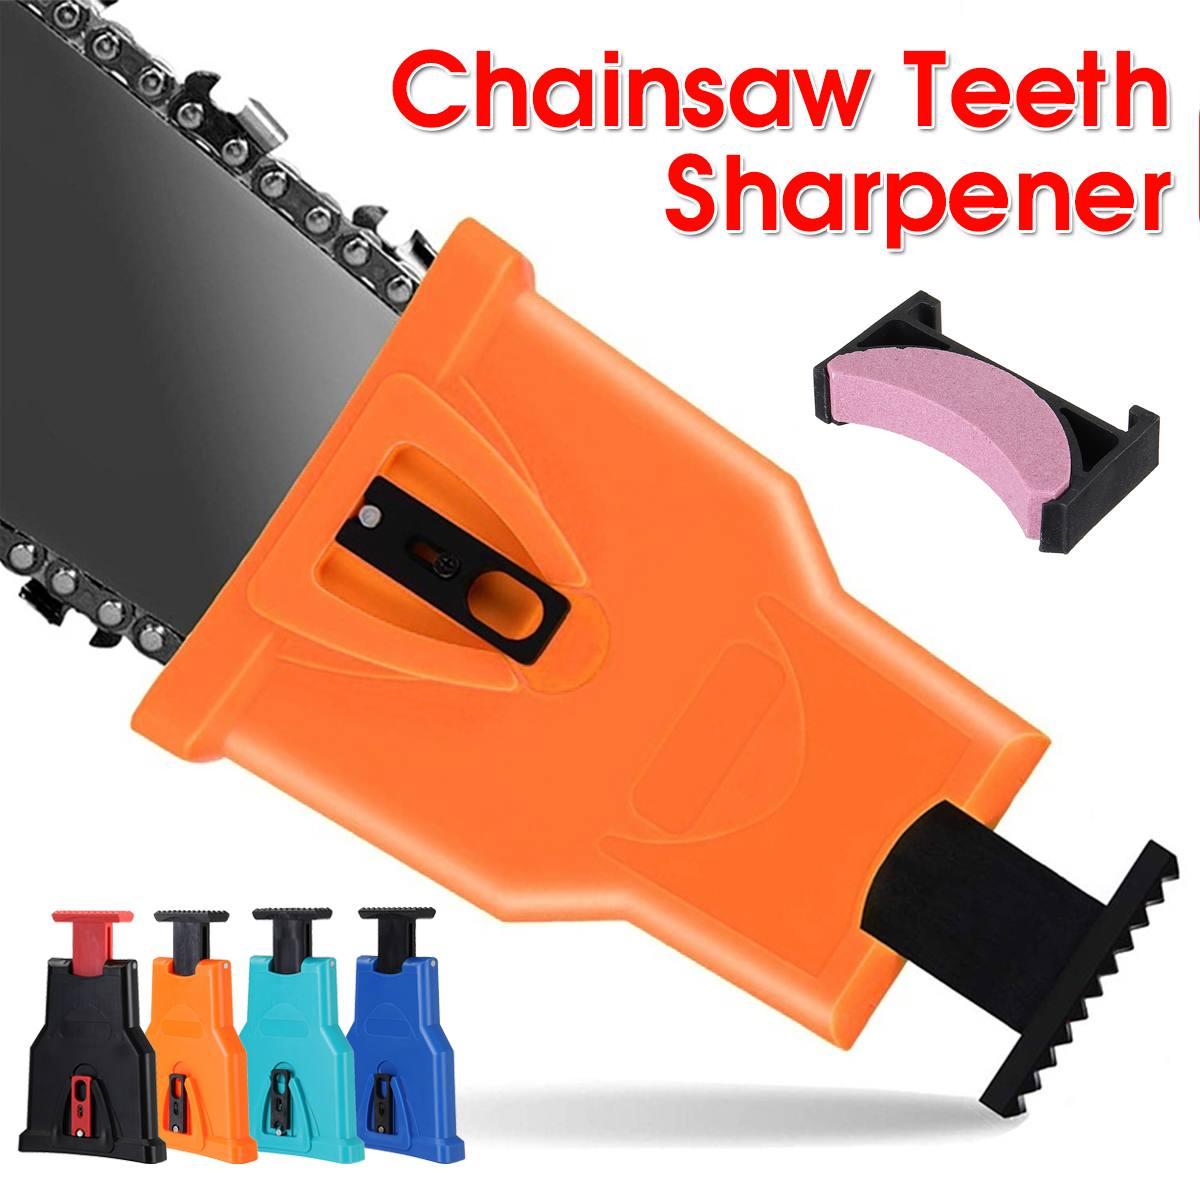 Chainsaw Teeths Sharpener Chain Saw Blade Sharpening Grinder Tool Power Bar Mount Saw Chain Sharpener Woodworking Tools